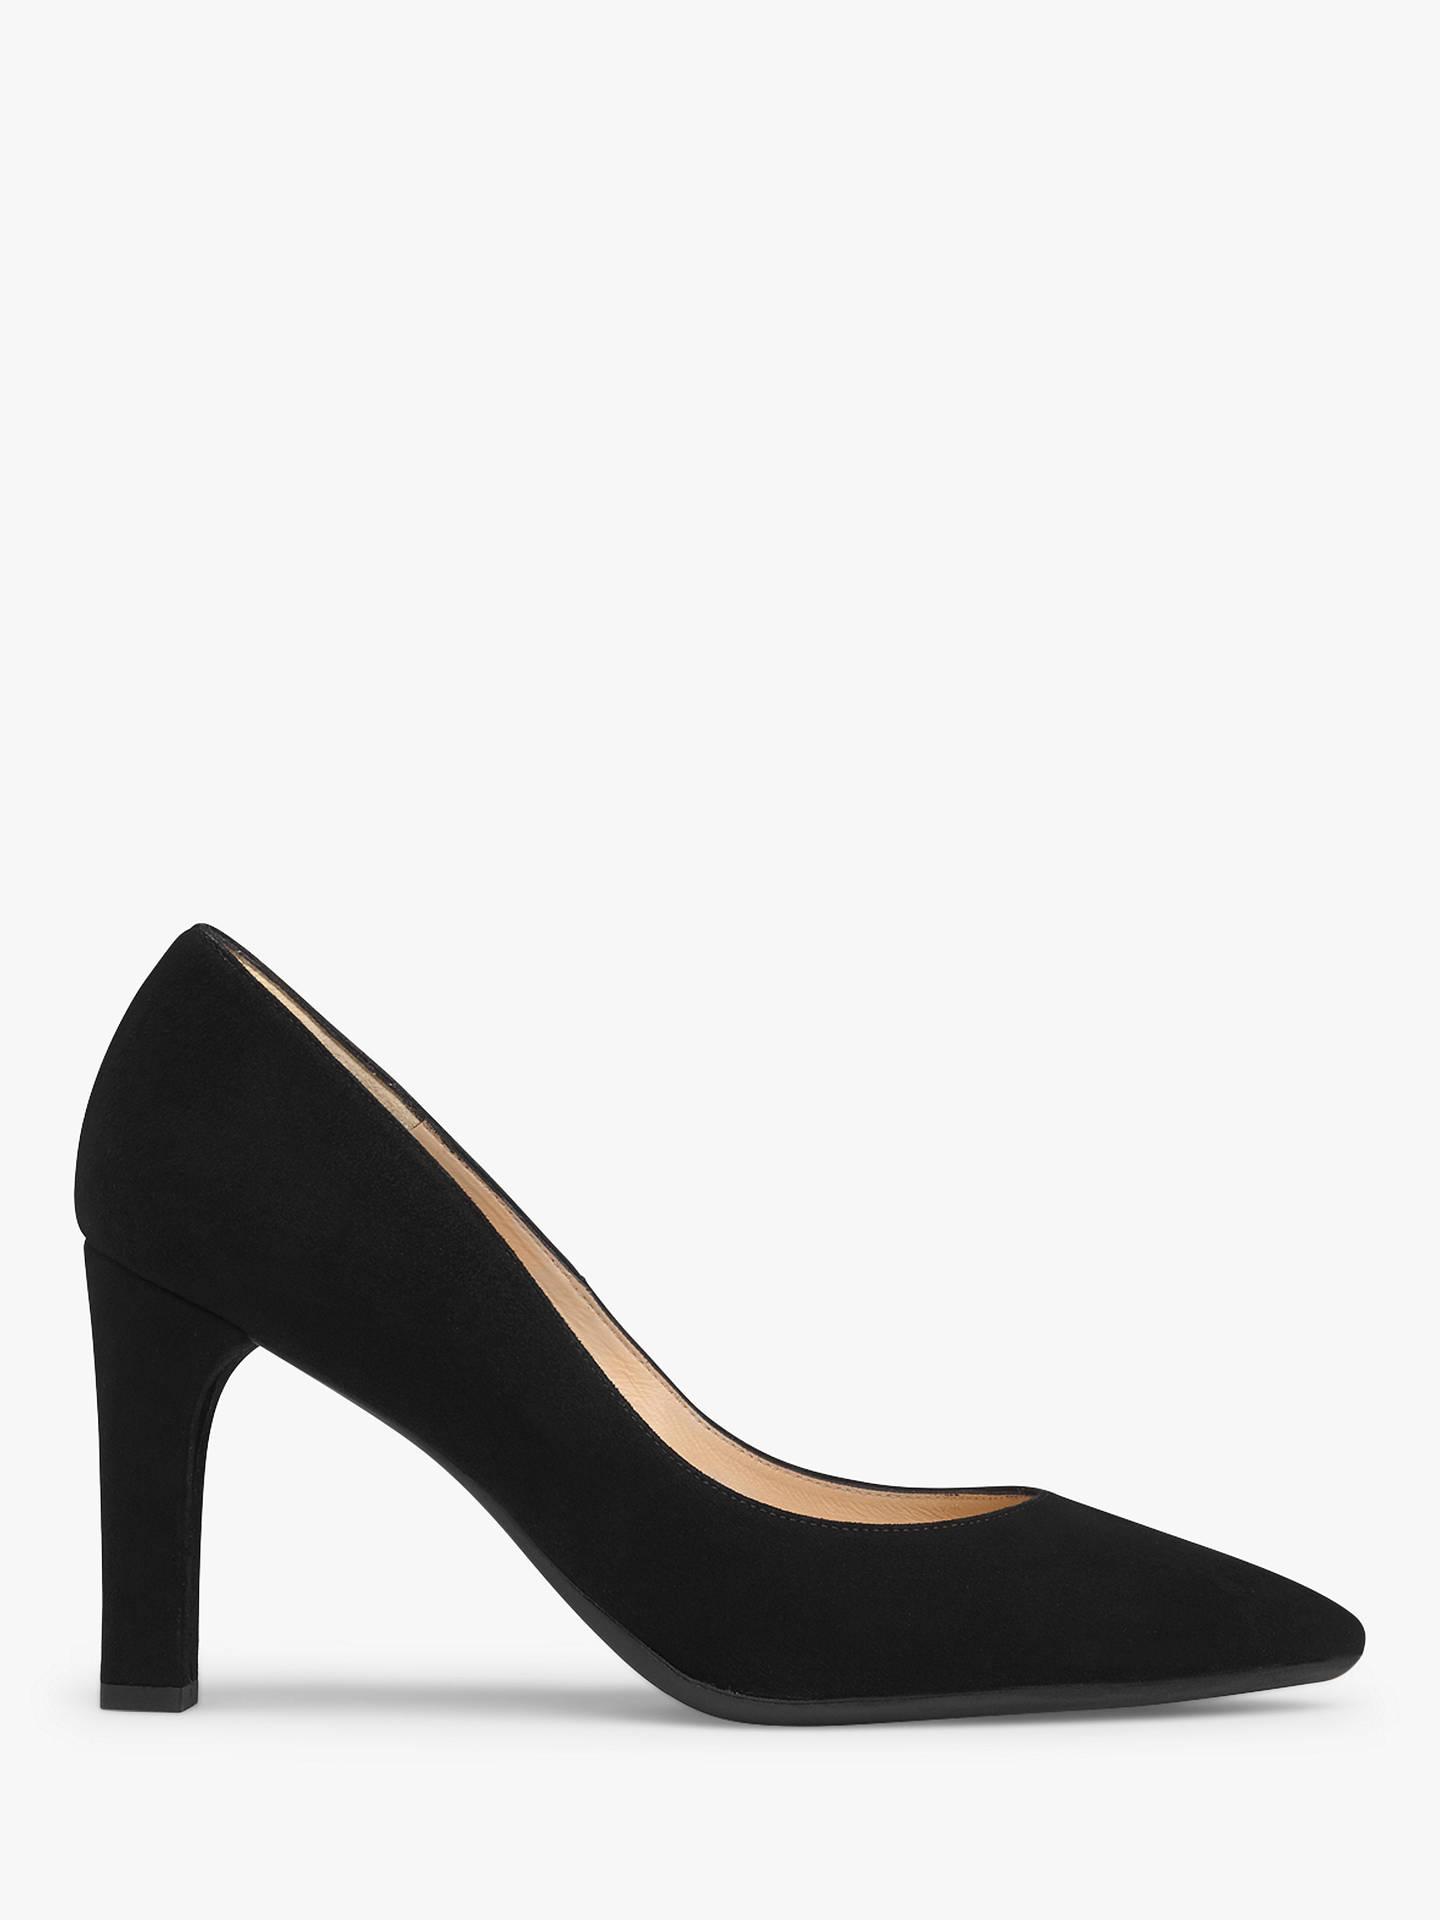 565426c2d12 L.K.Bennett Tess Block Heeled Court Shoes at John Lewis   Partners